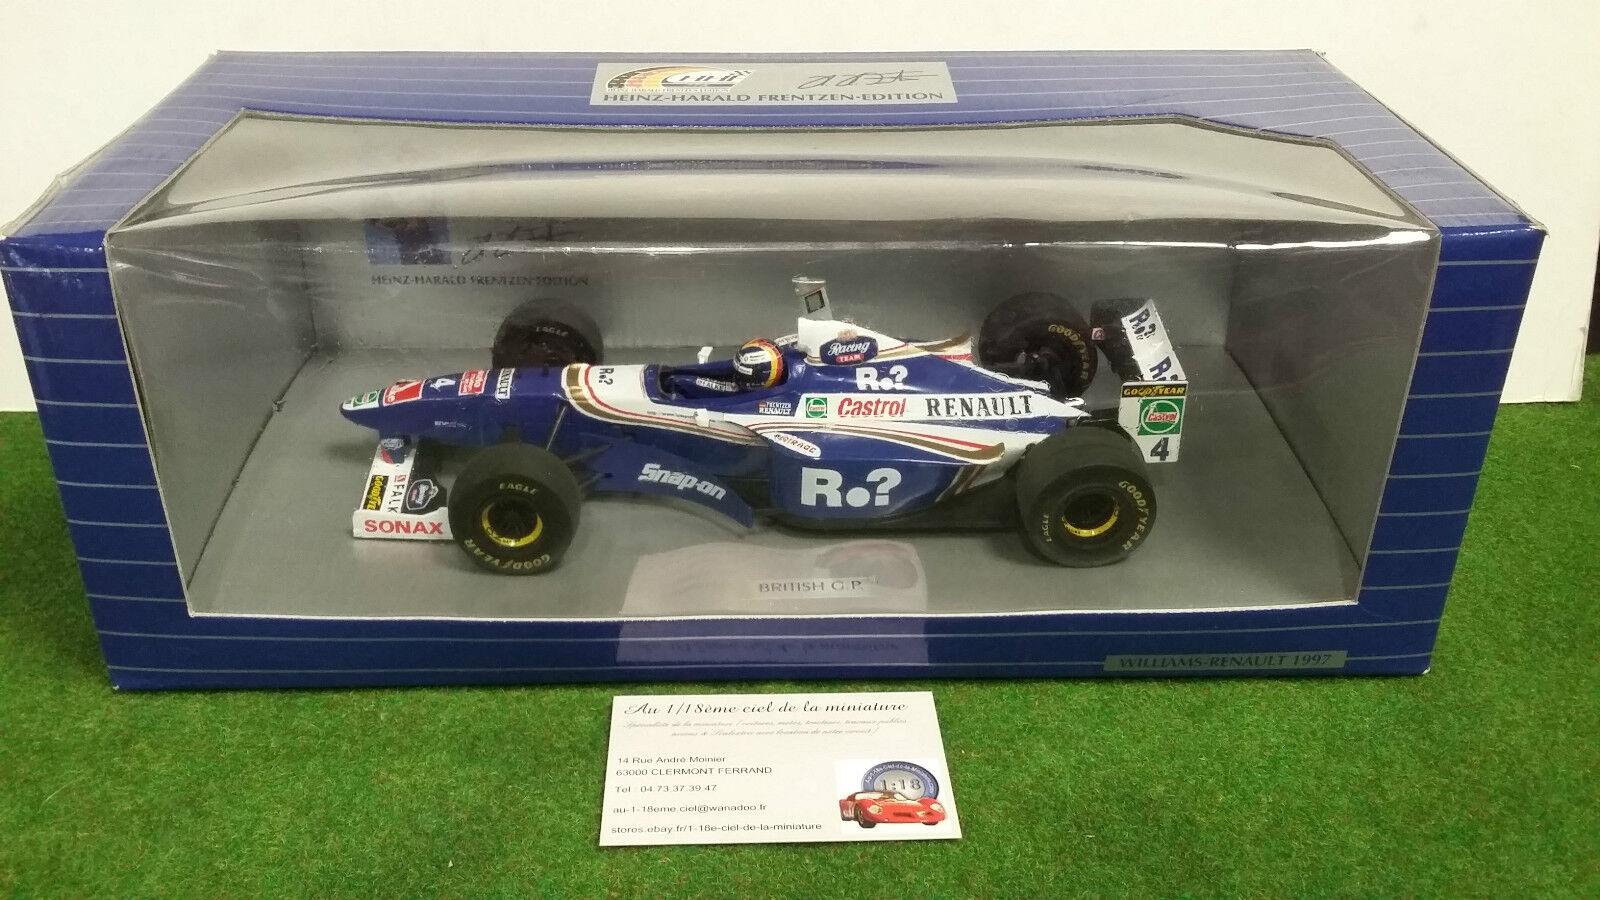 F1 WILLIAMS RENAULT FW19 FRENTZEN British GP 1997 au 1 18 d ONYX X6020 formule 1